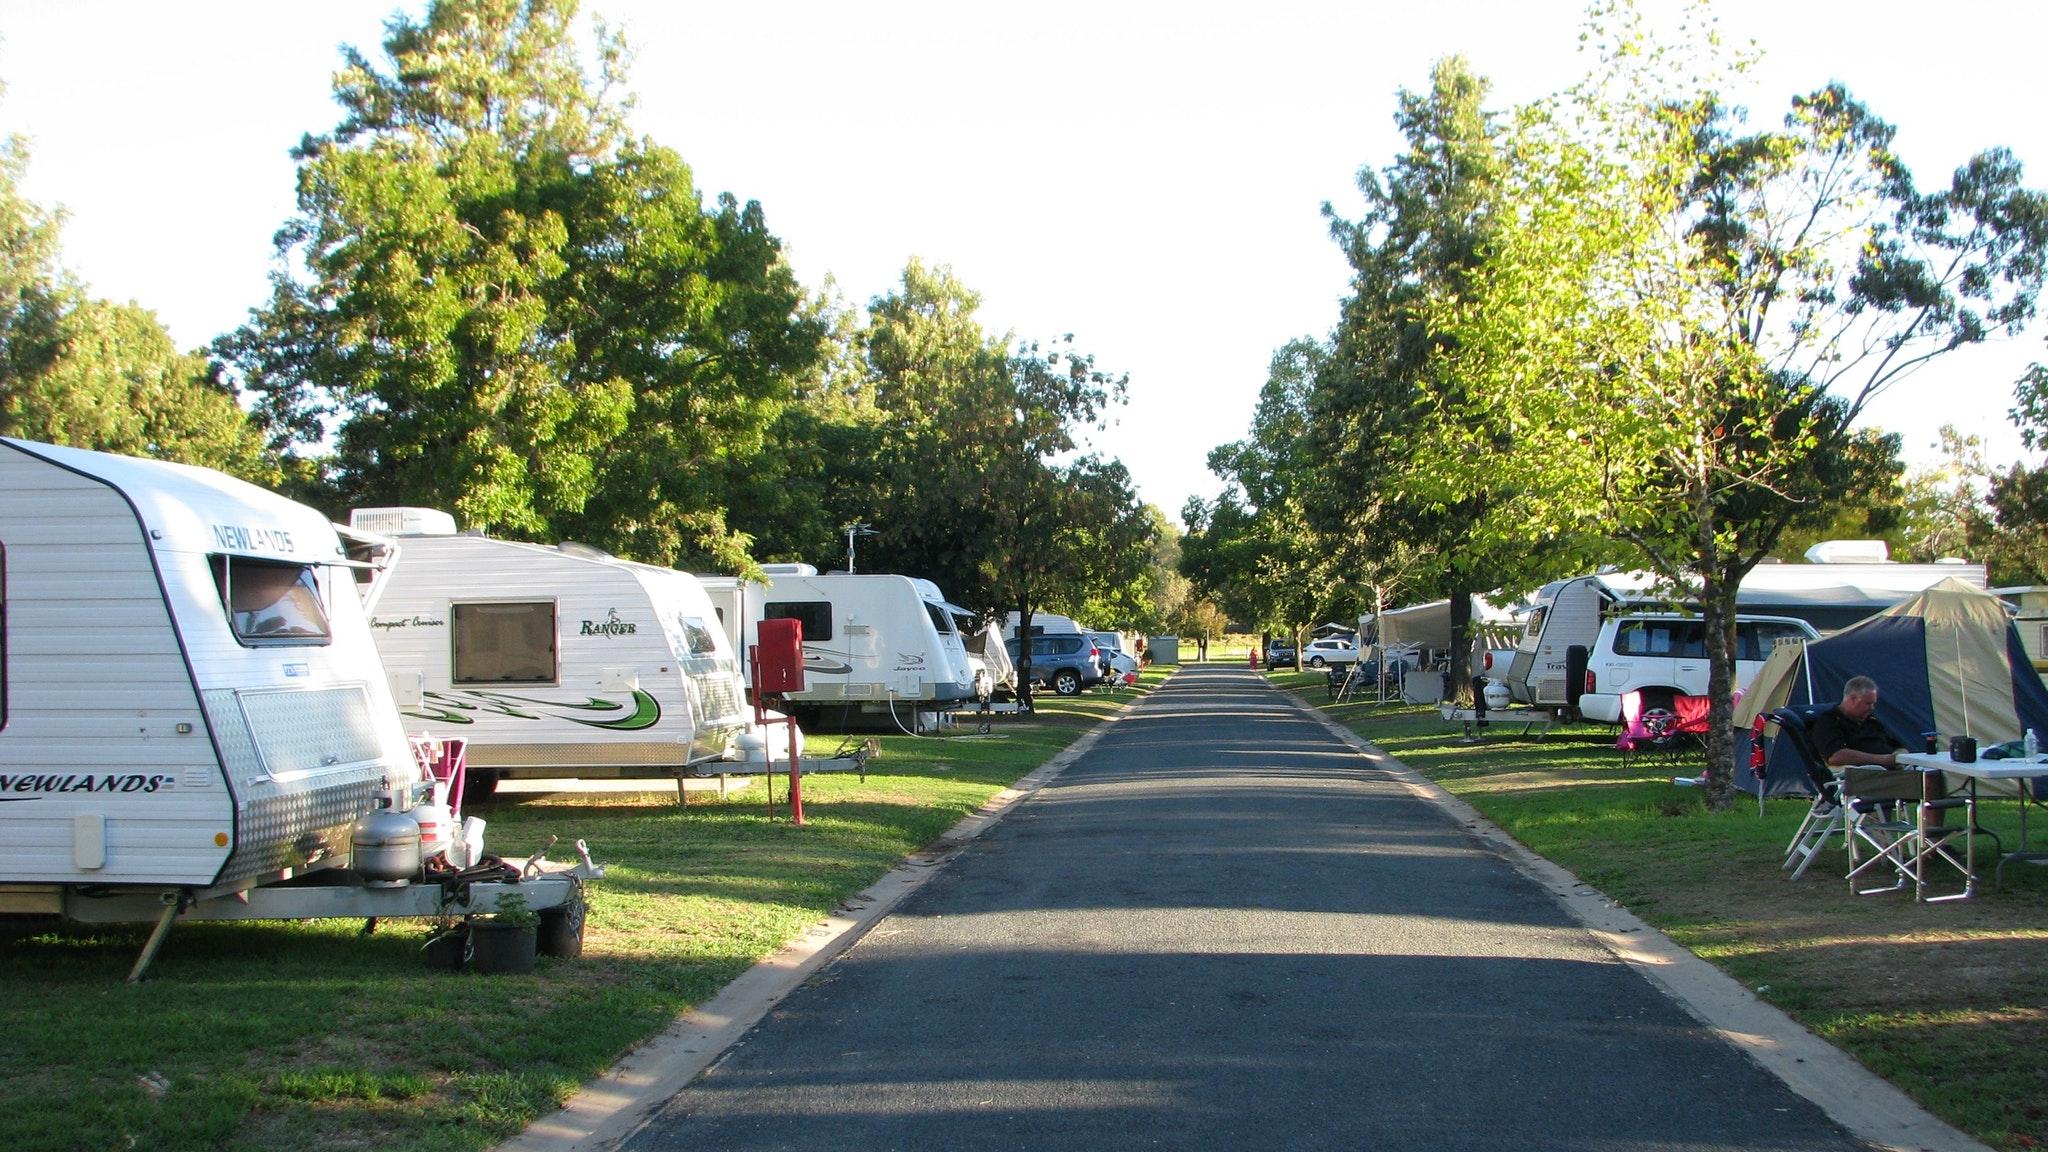 Some of the caravan sites